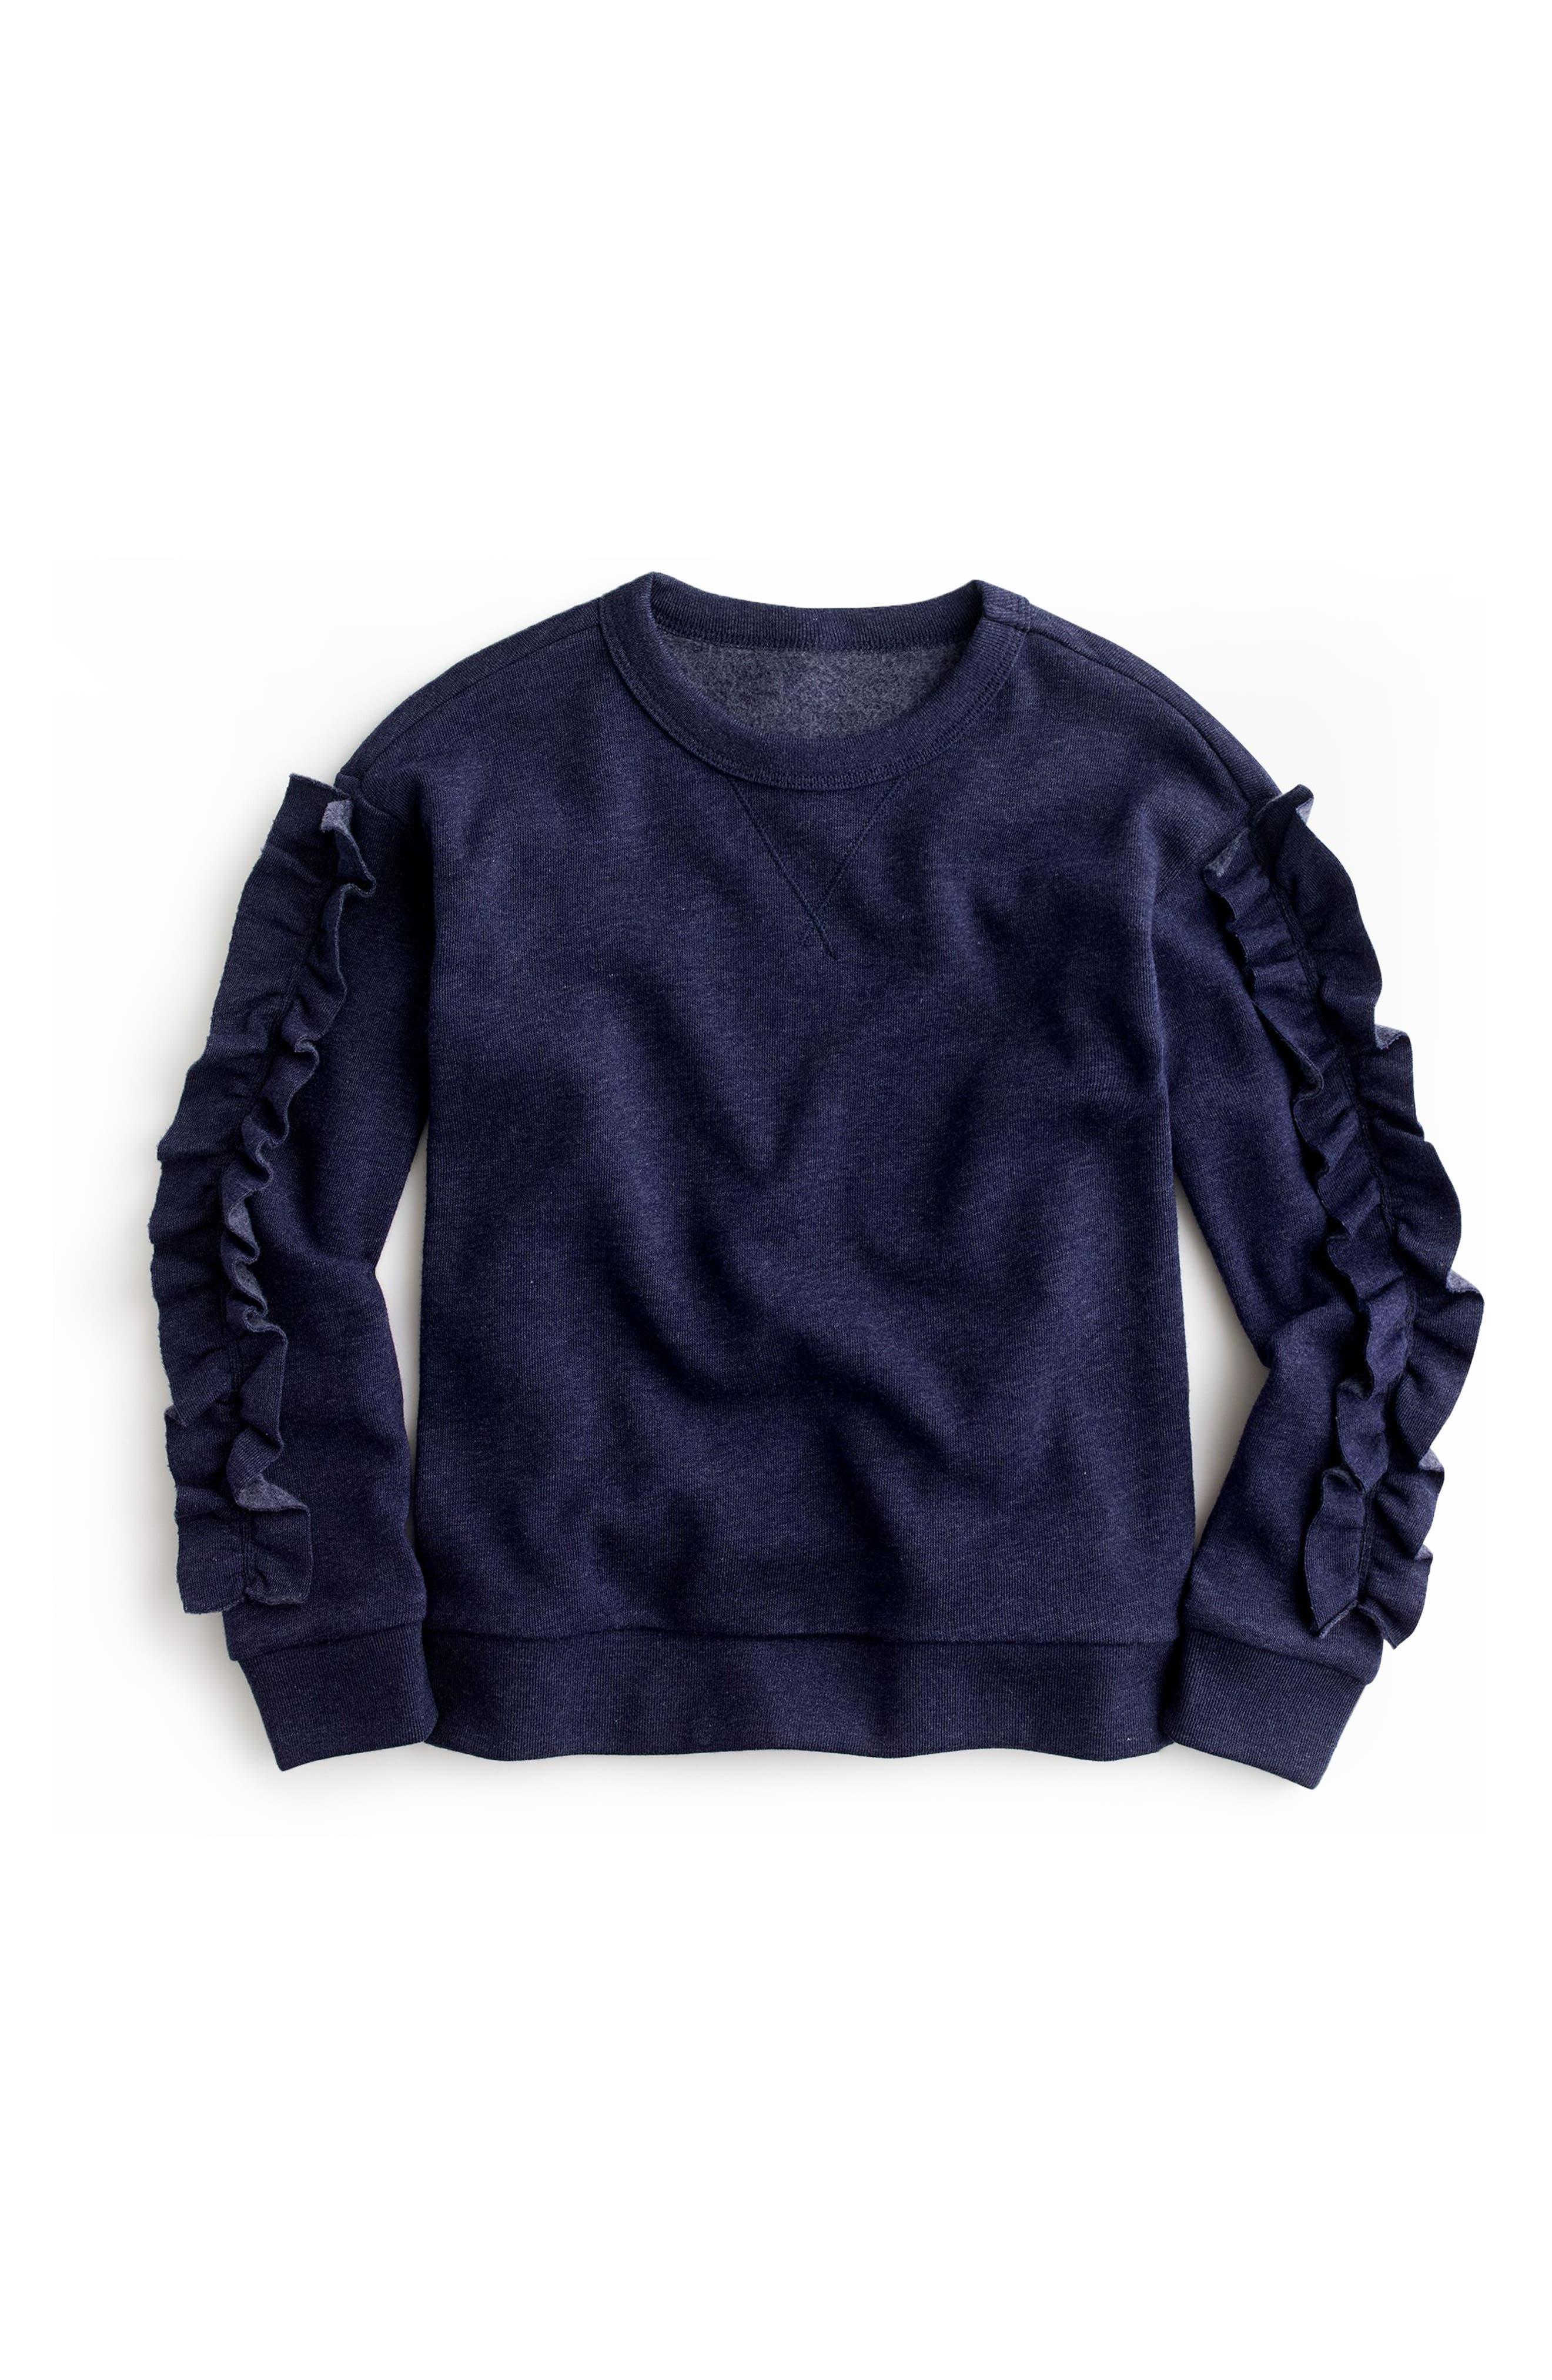 crewcuts by J.Crew Ruffle Trim Sweatshirt (Toddler Girls, Little Girls & Big Girls)